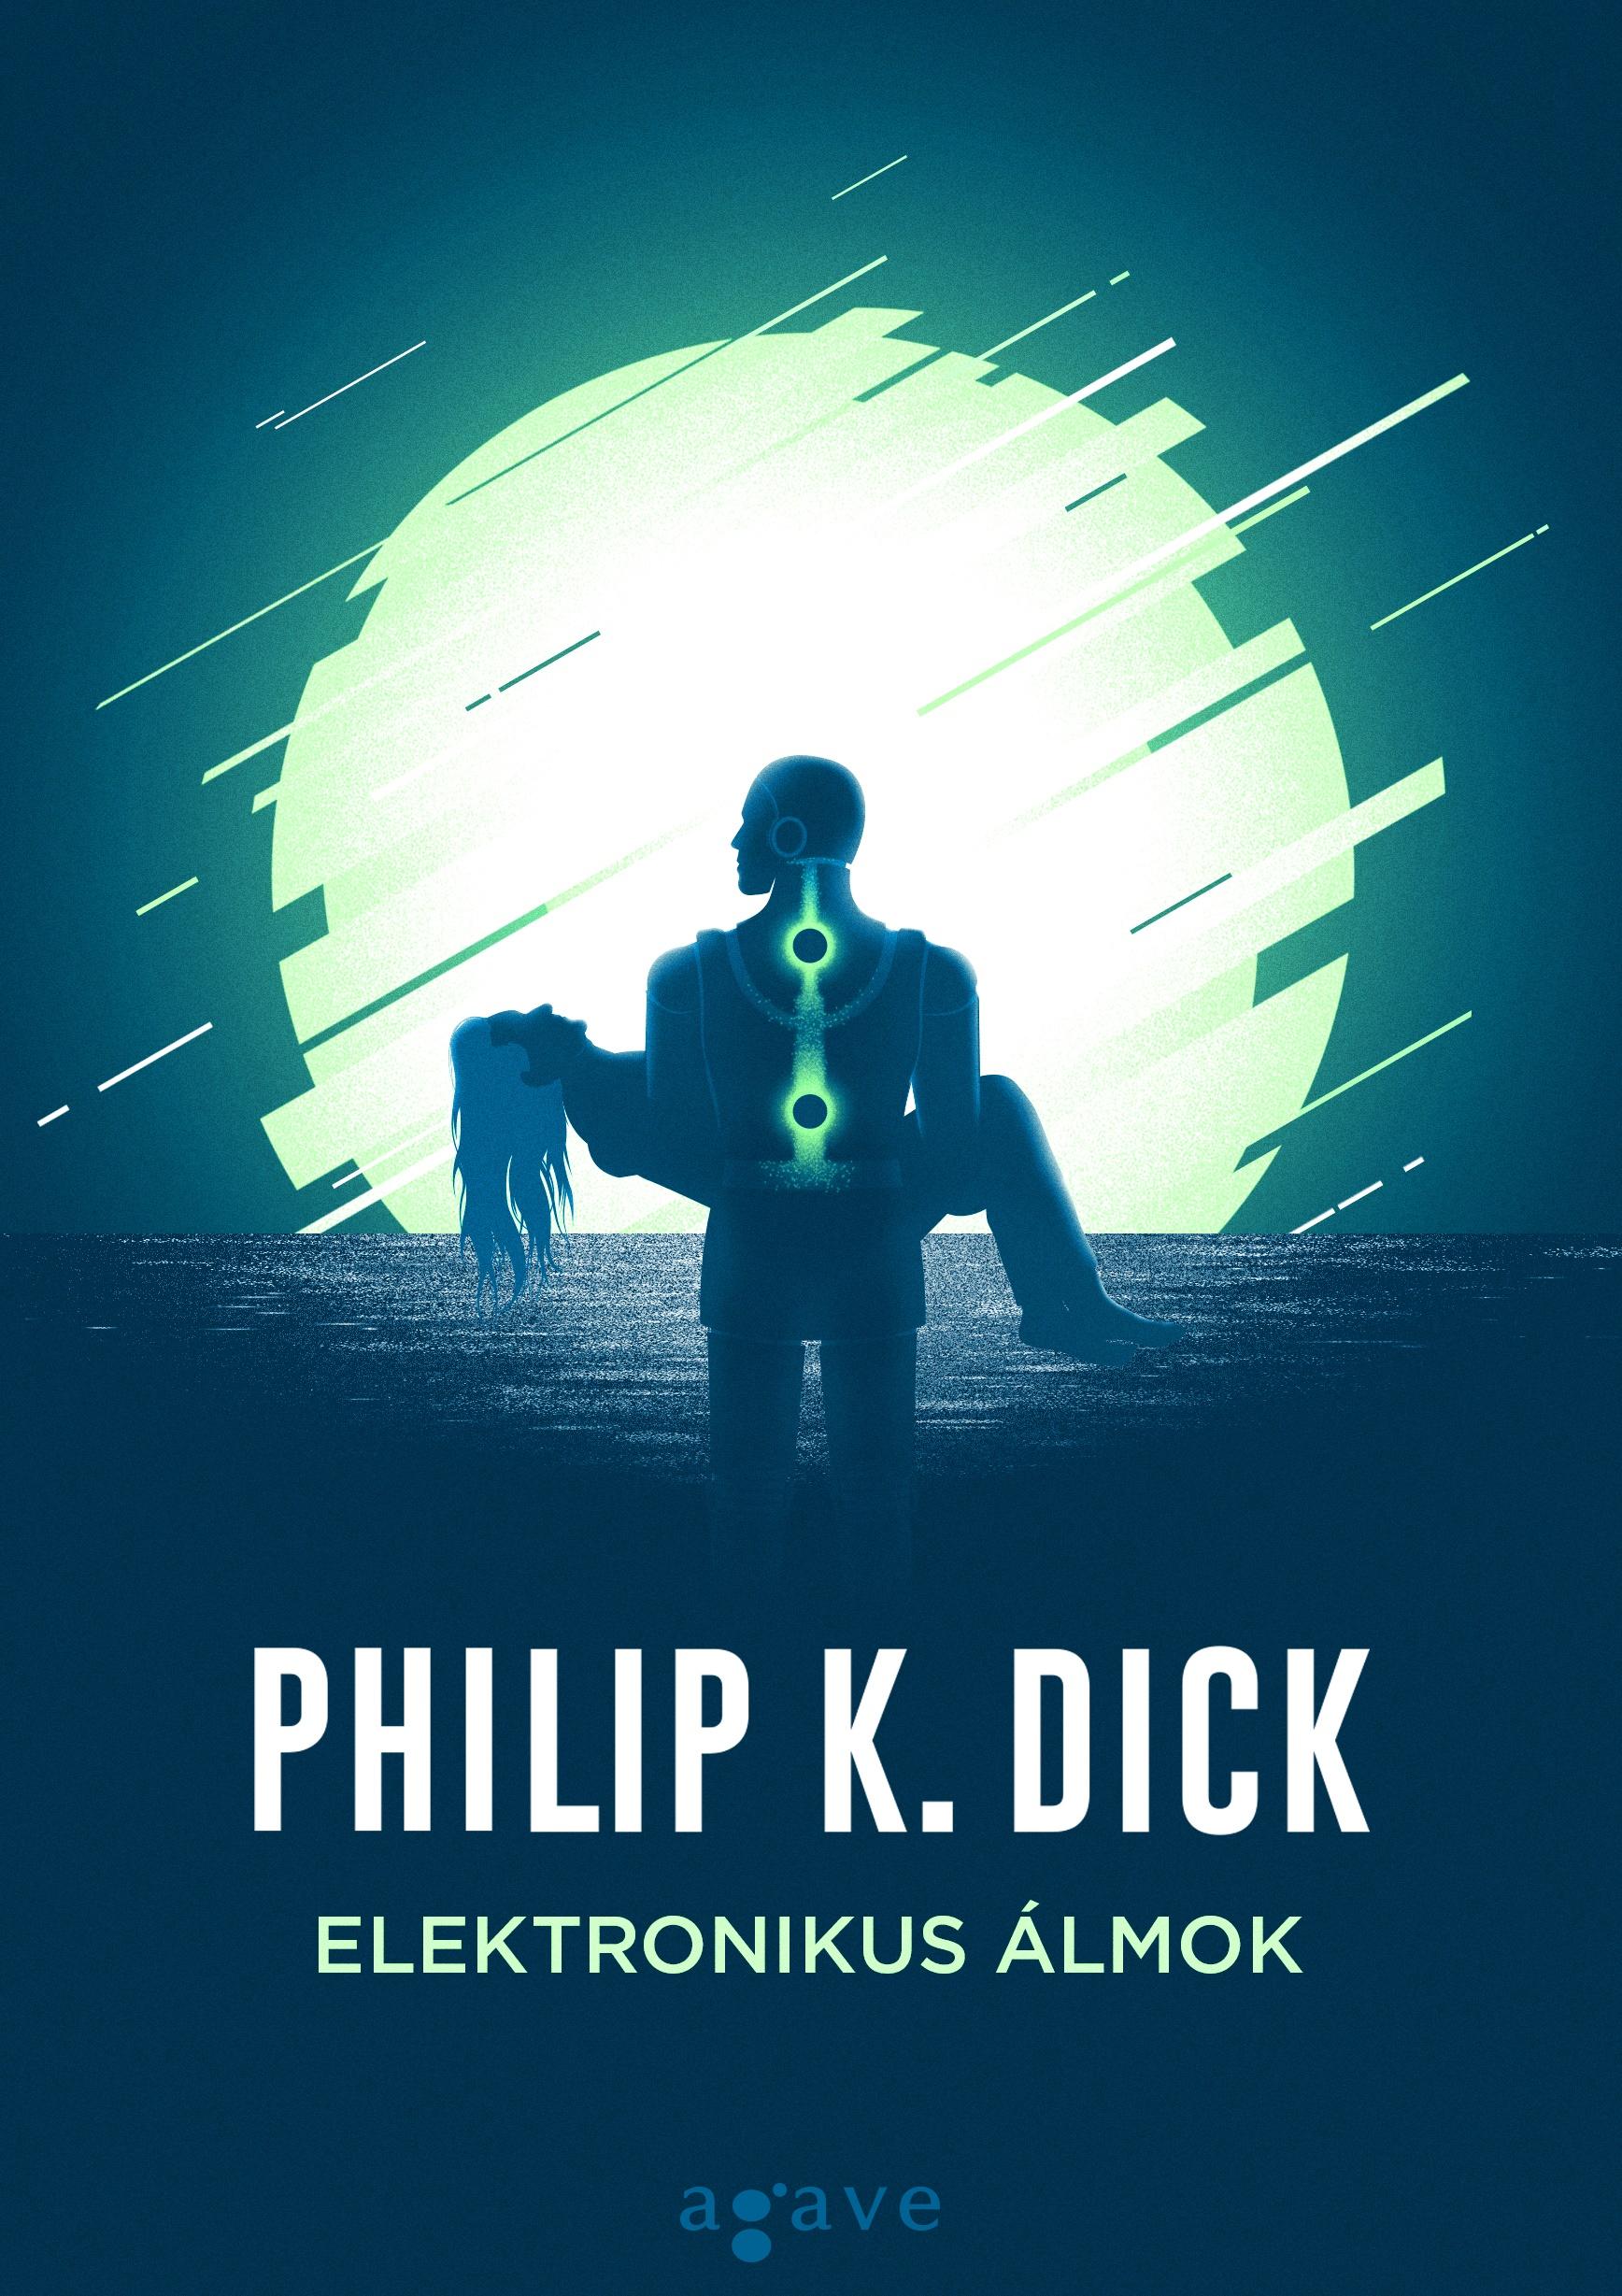 philip_k_dick_eletronikus_almok_b1.jpg